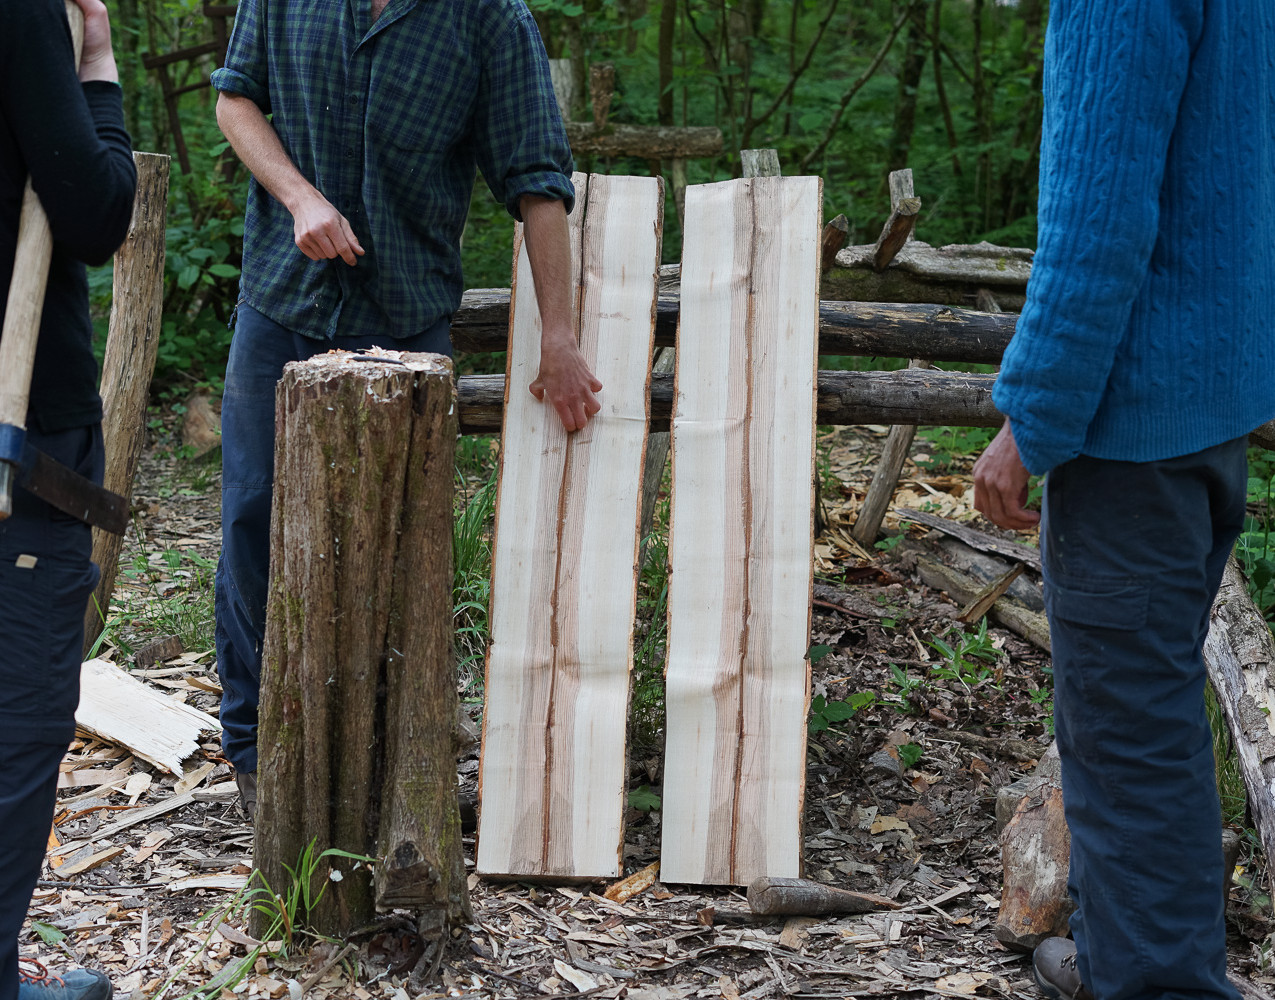 The split wood